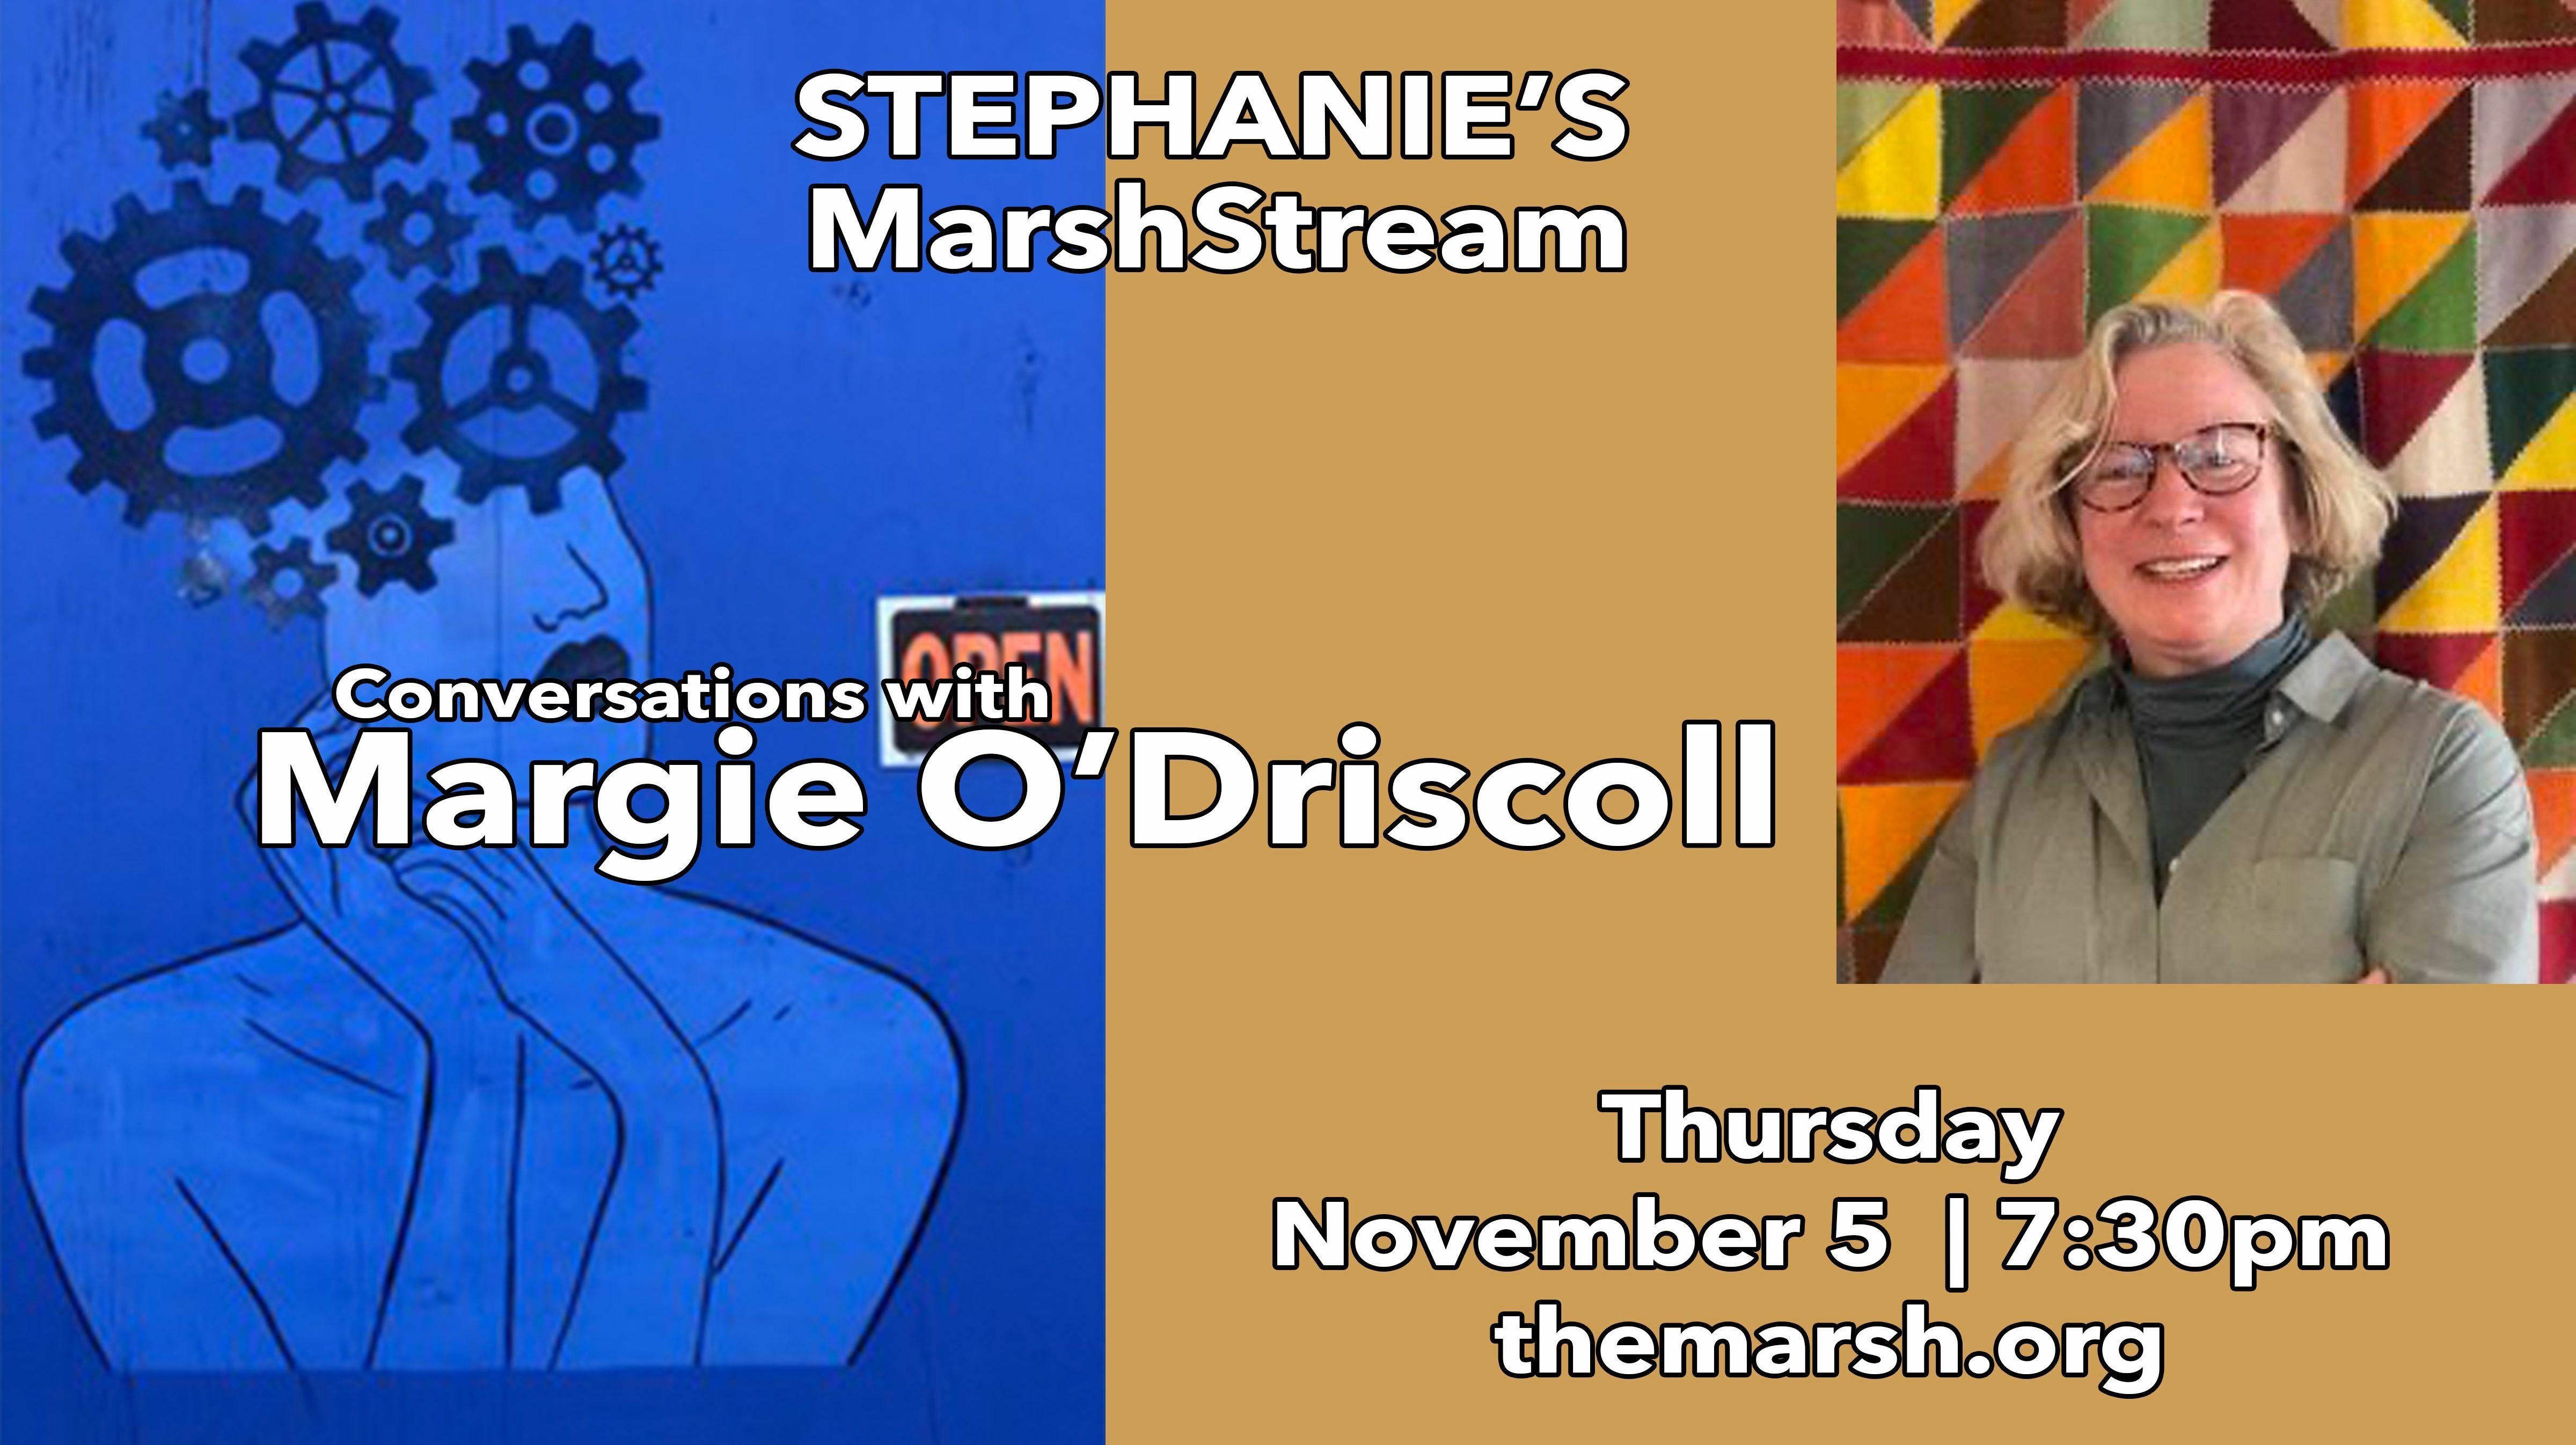 Stephanie's MarshStream with Margie O'Driscoll